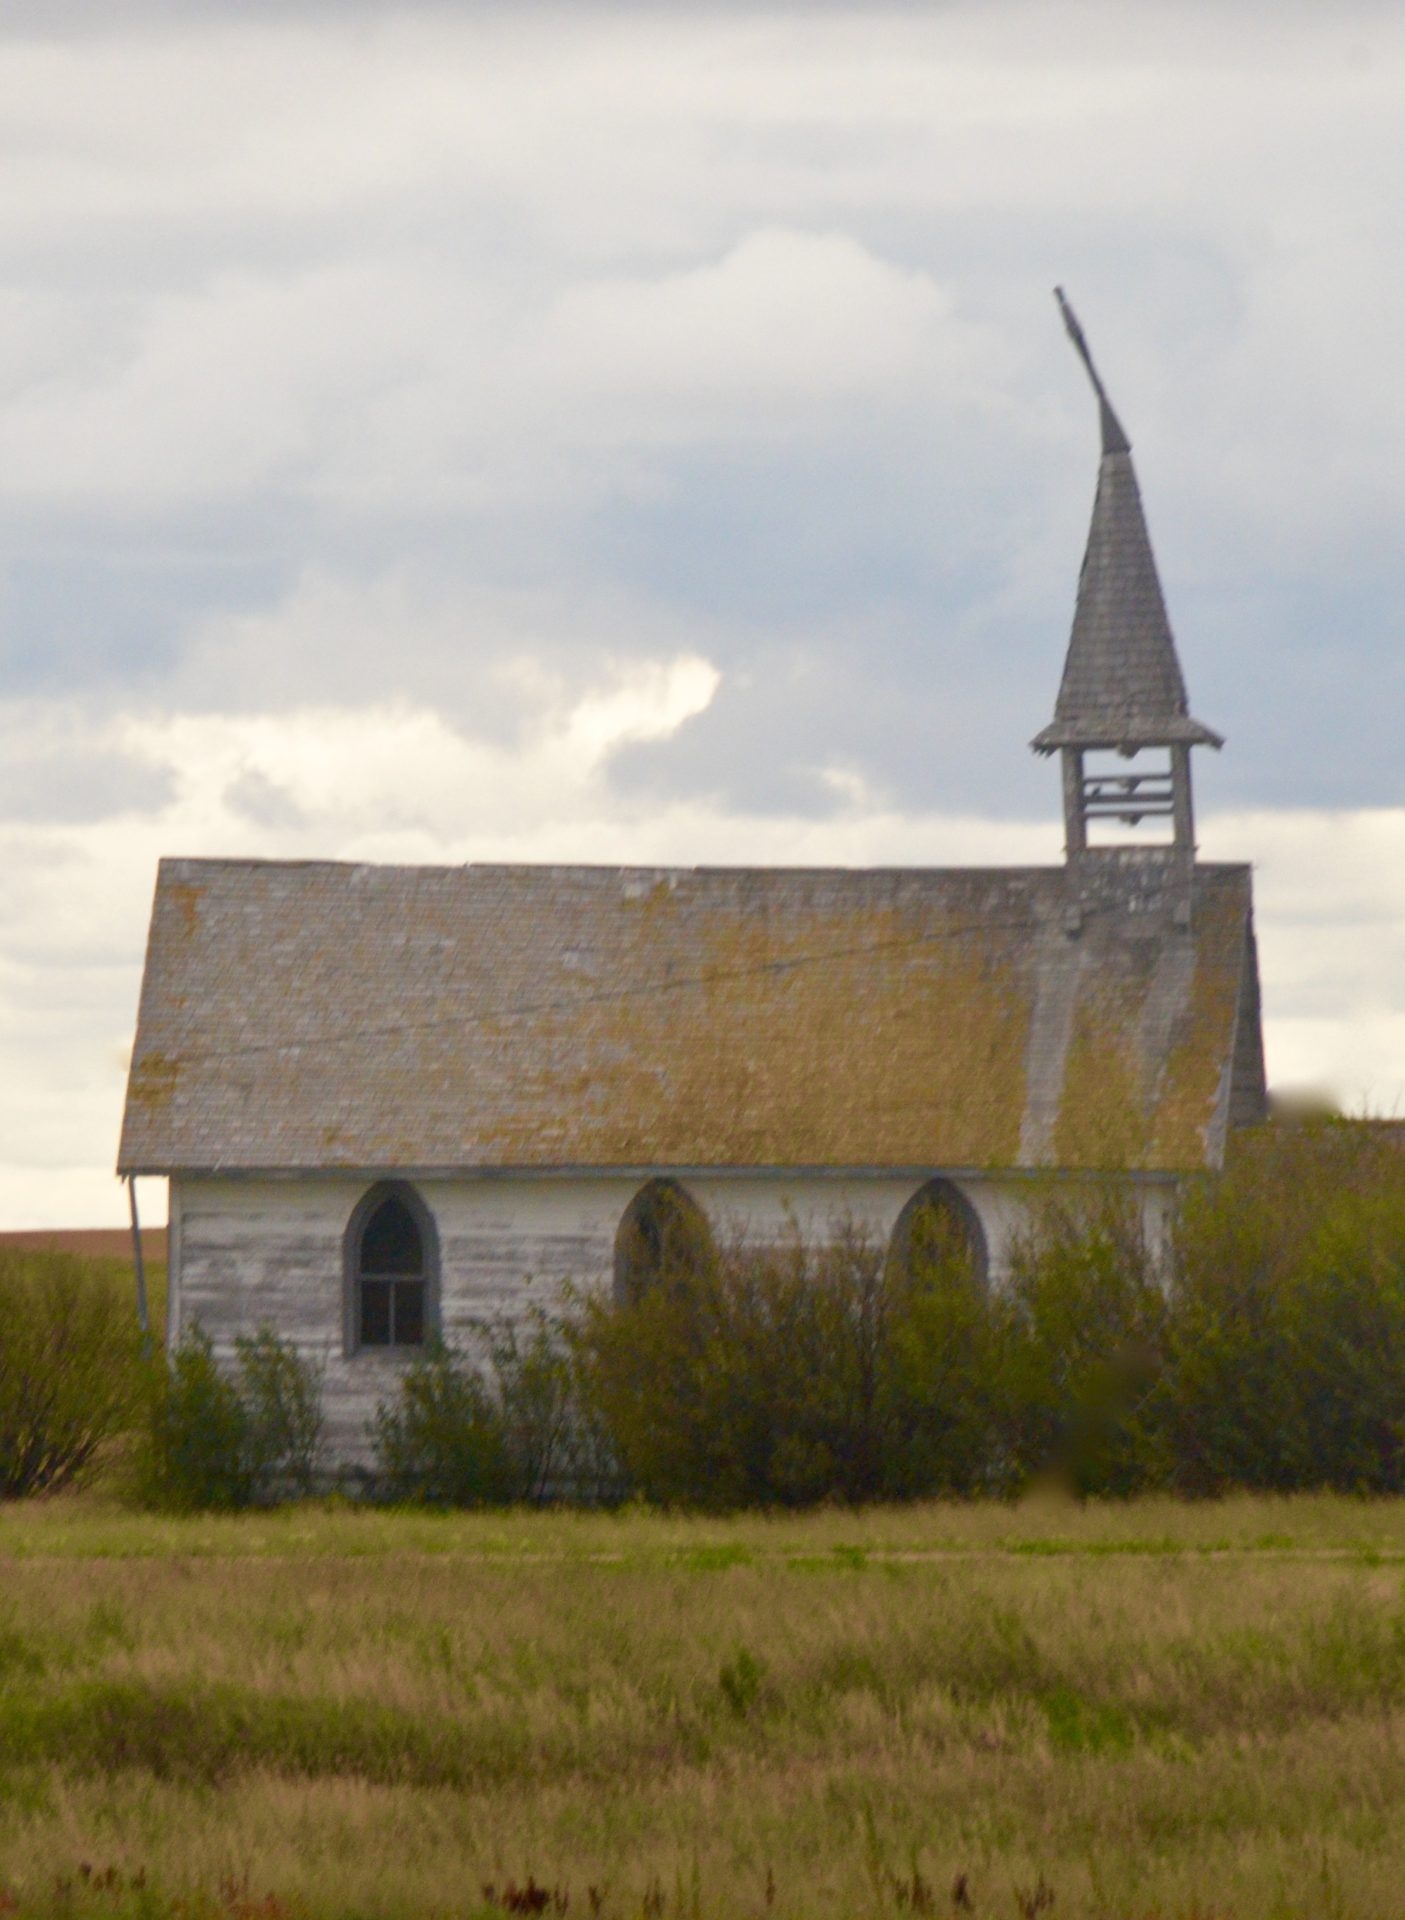 Saskatchewan - Land of Living Skies - The Maritime Explorer